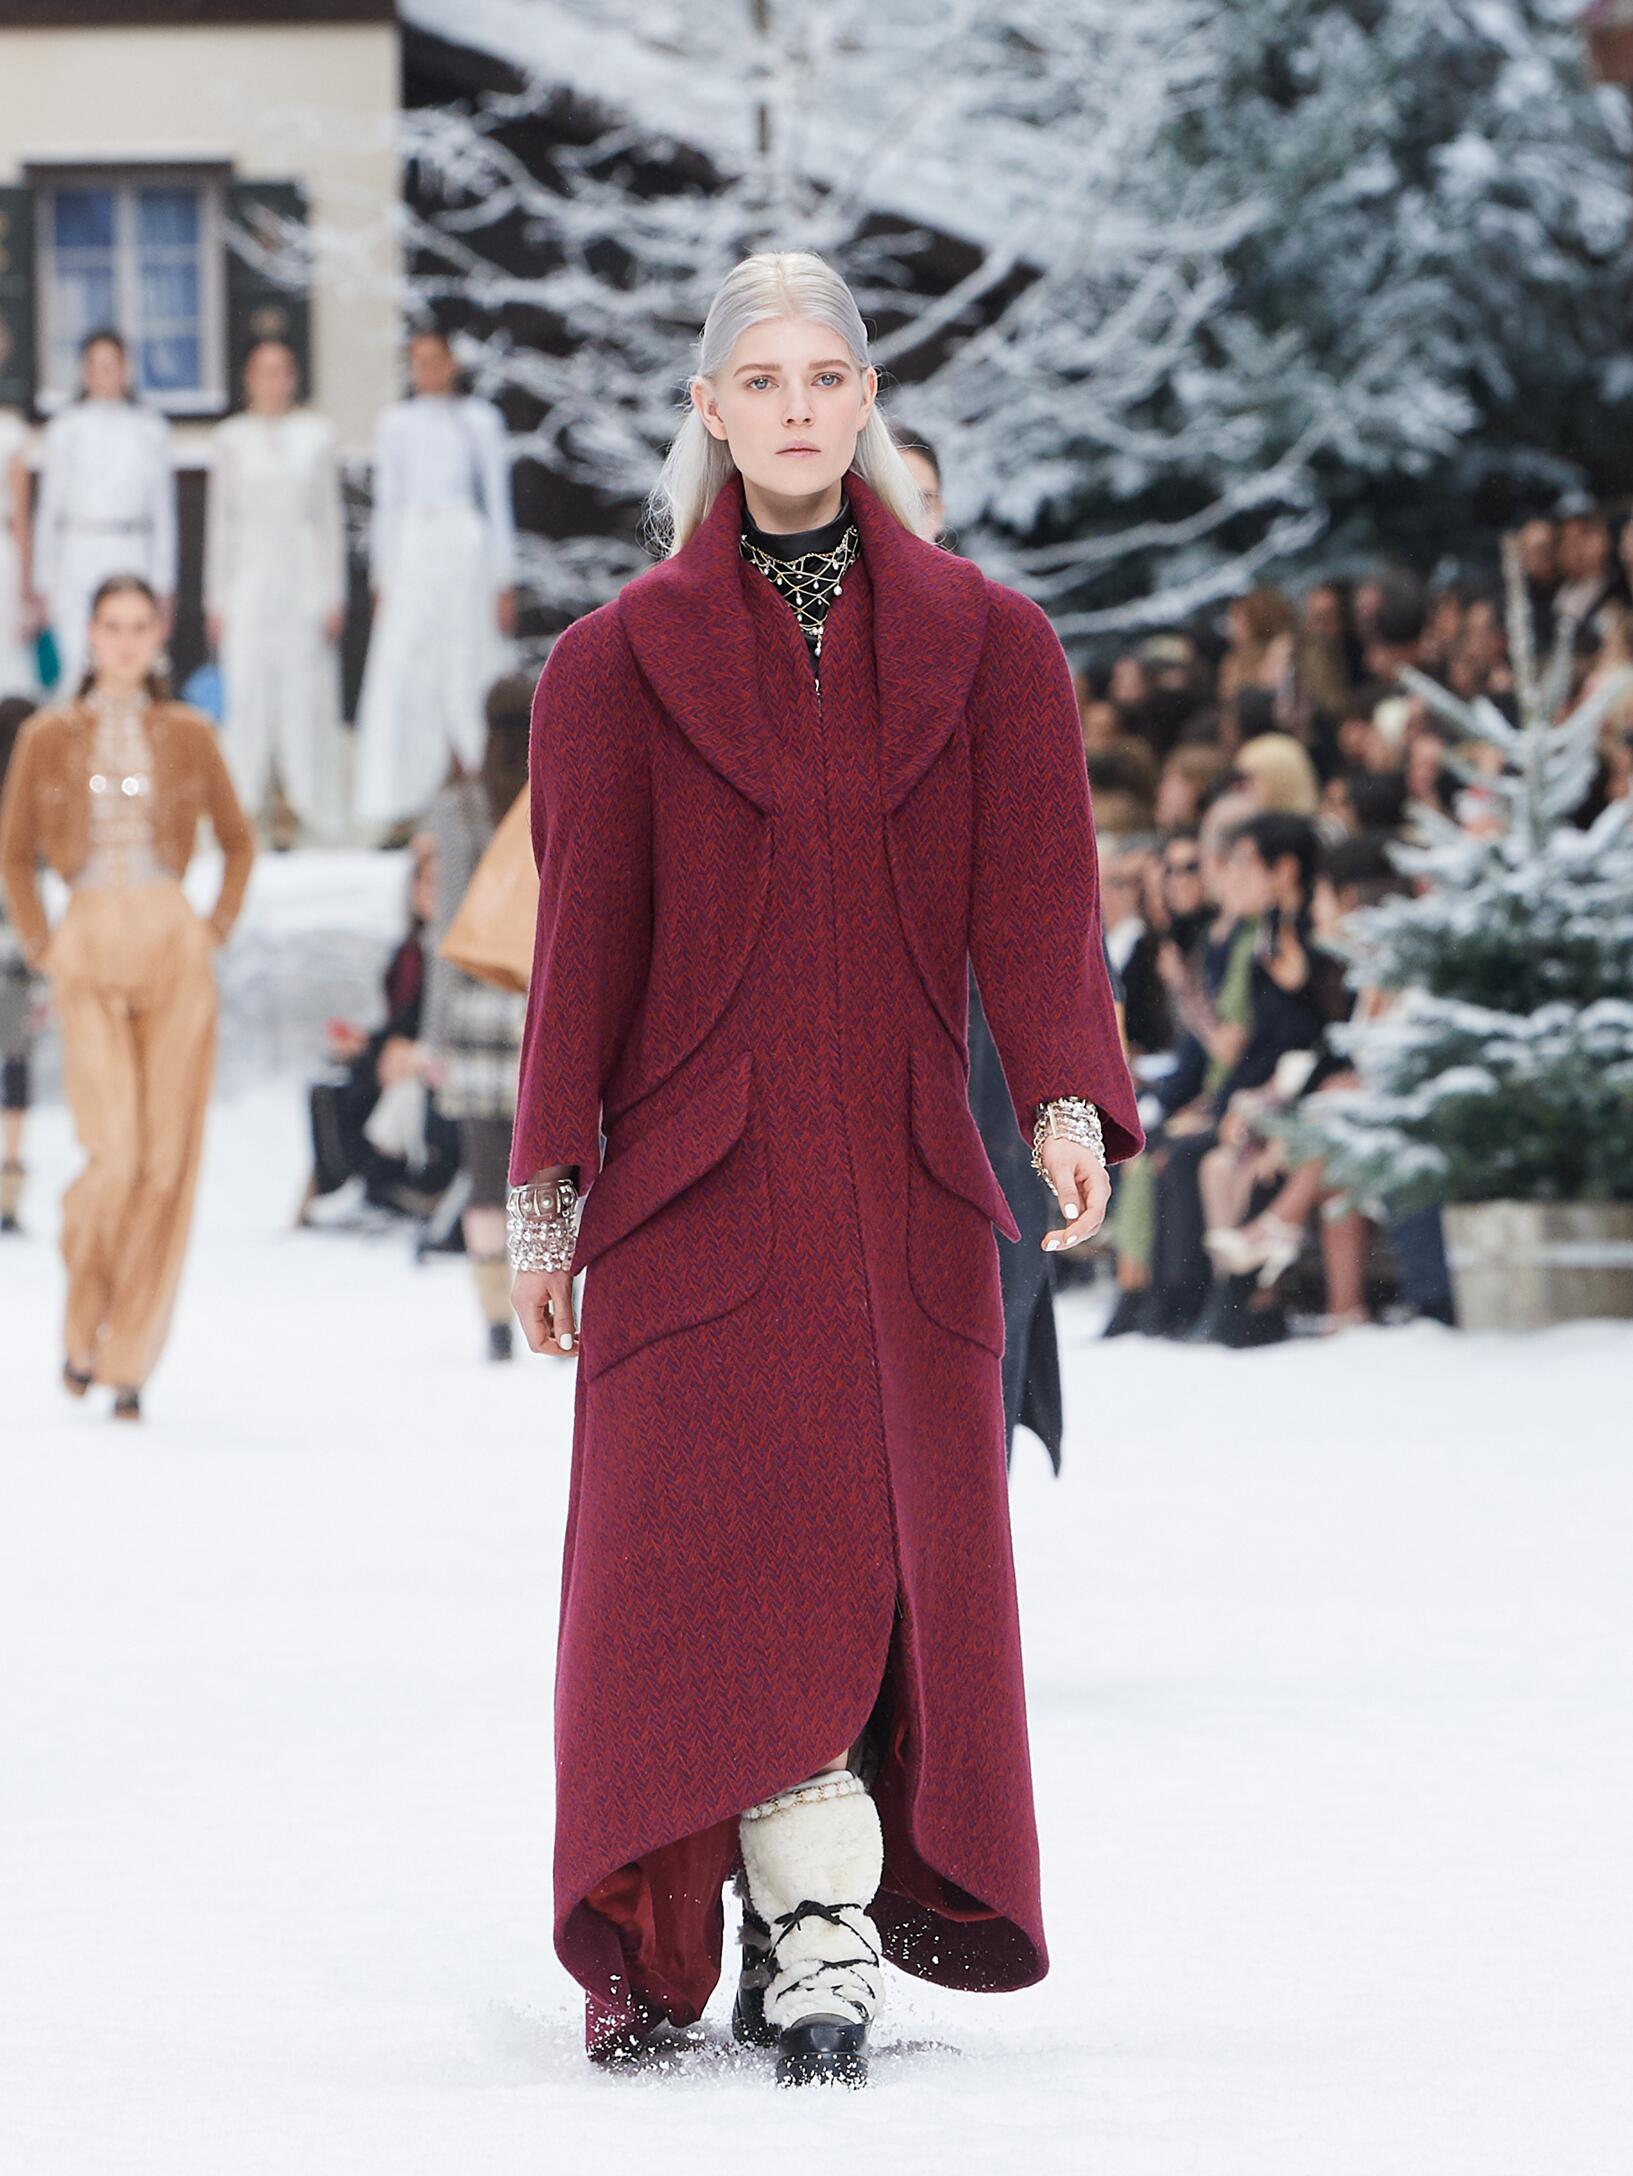 2019 Chanel Fall Catwalk